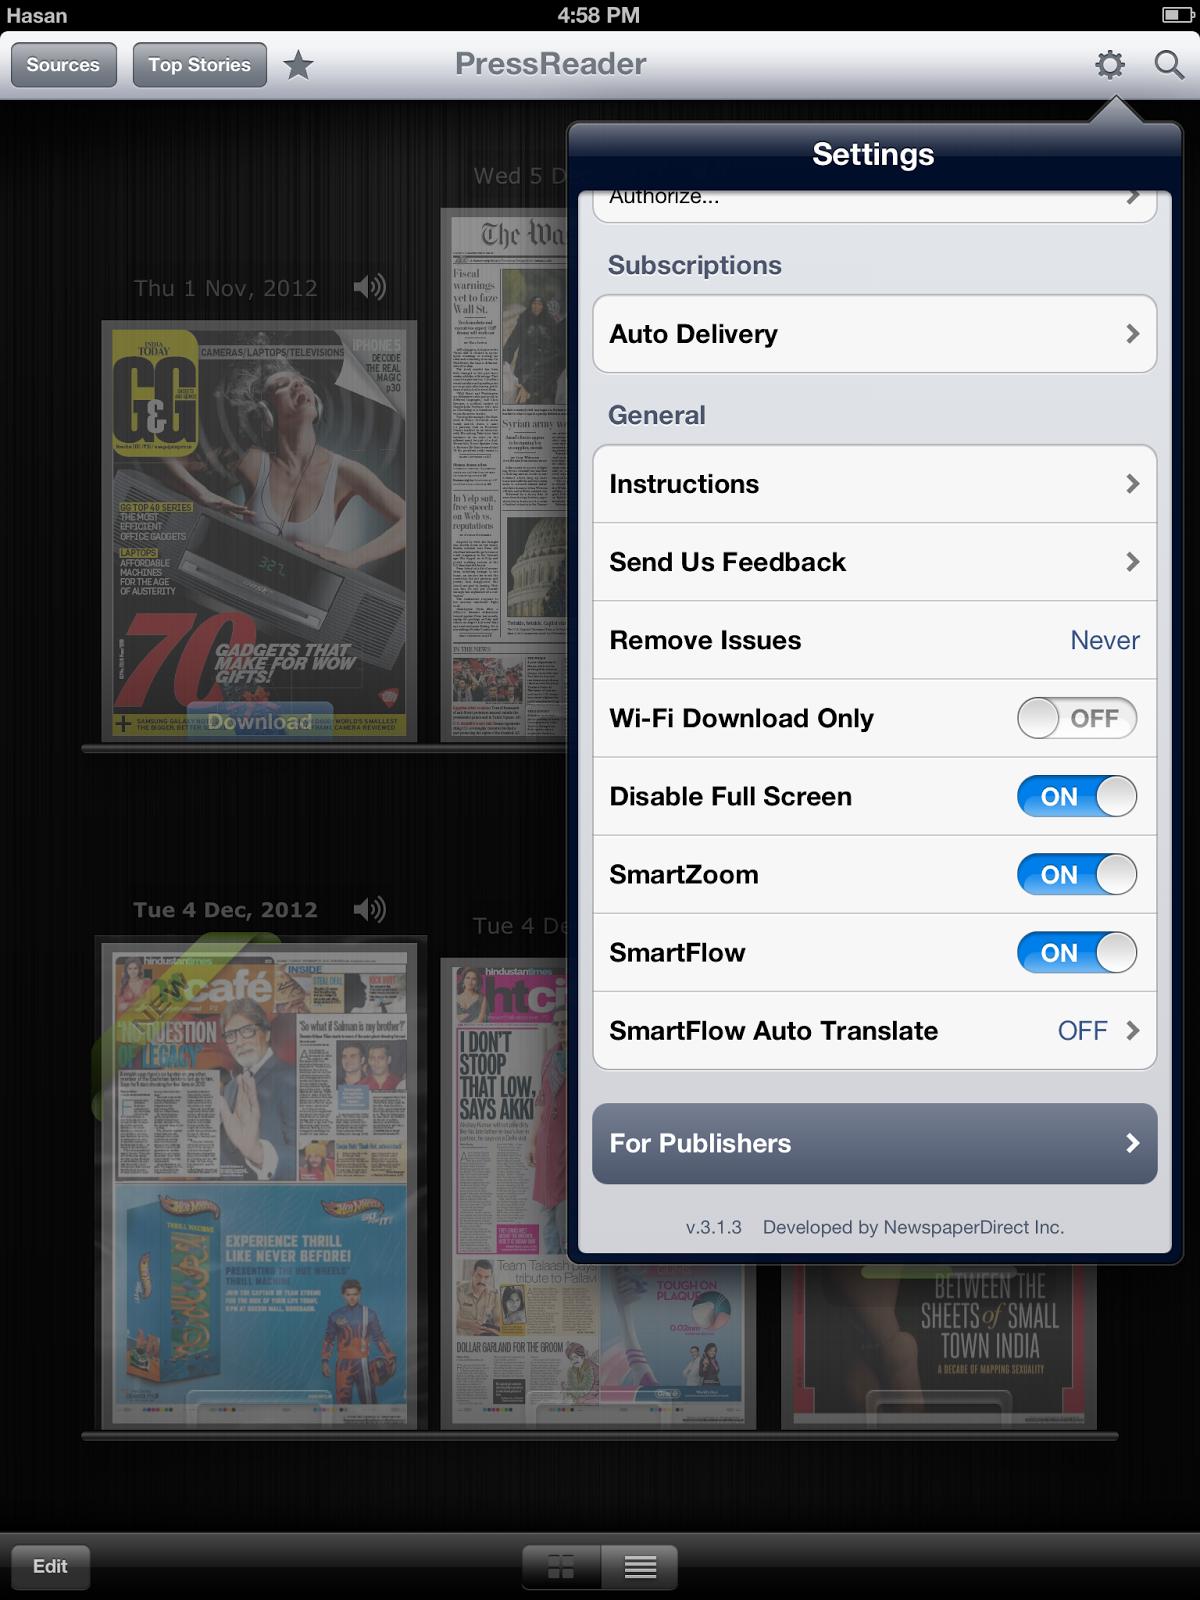 Geeky Apple - The new iPad 3, iPhone iOS6 Jailbreaking and Unlocking